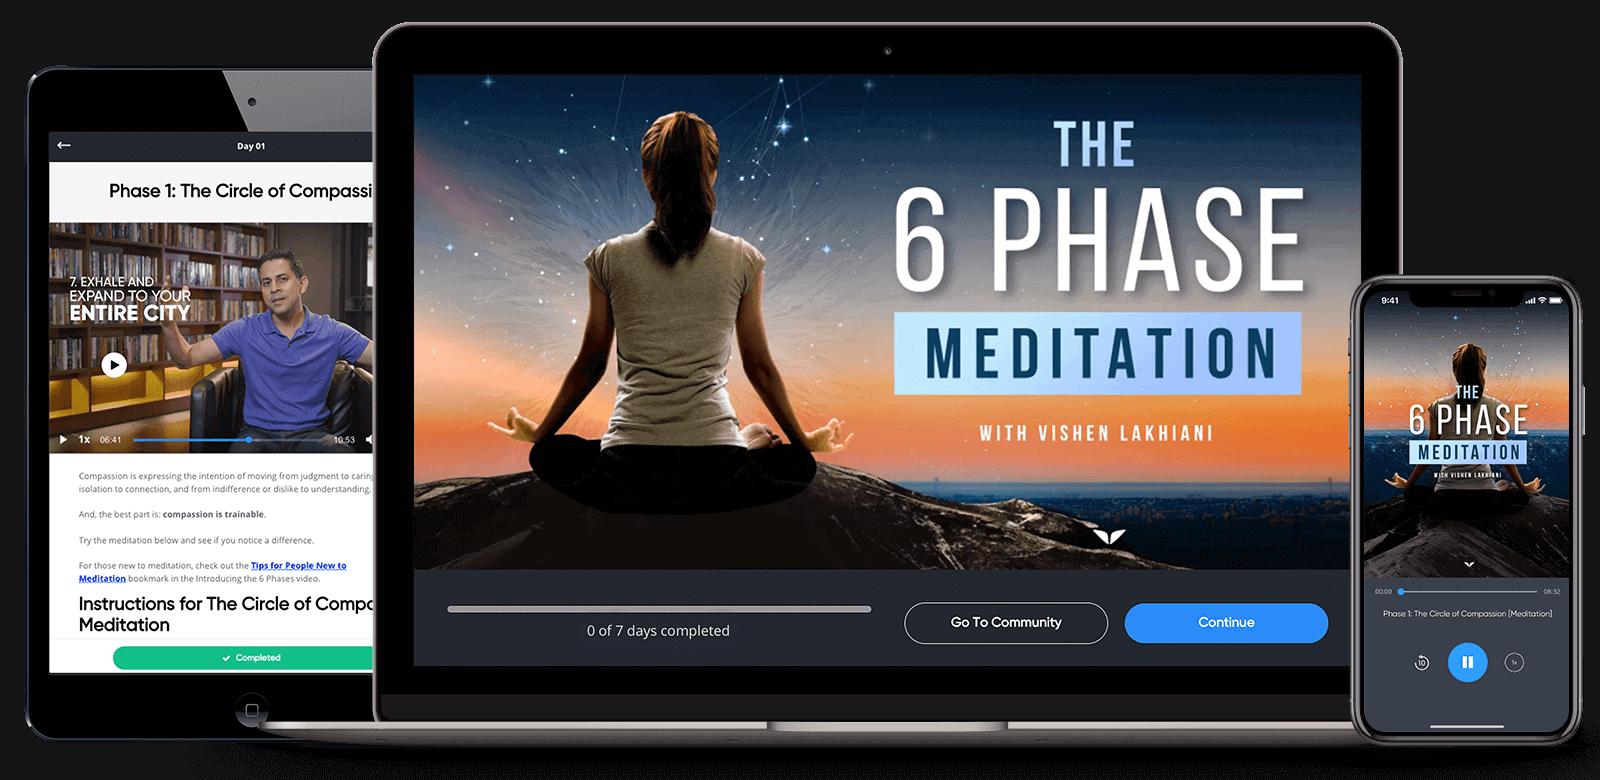 6 phase meditation